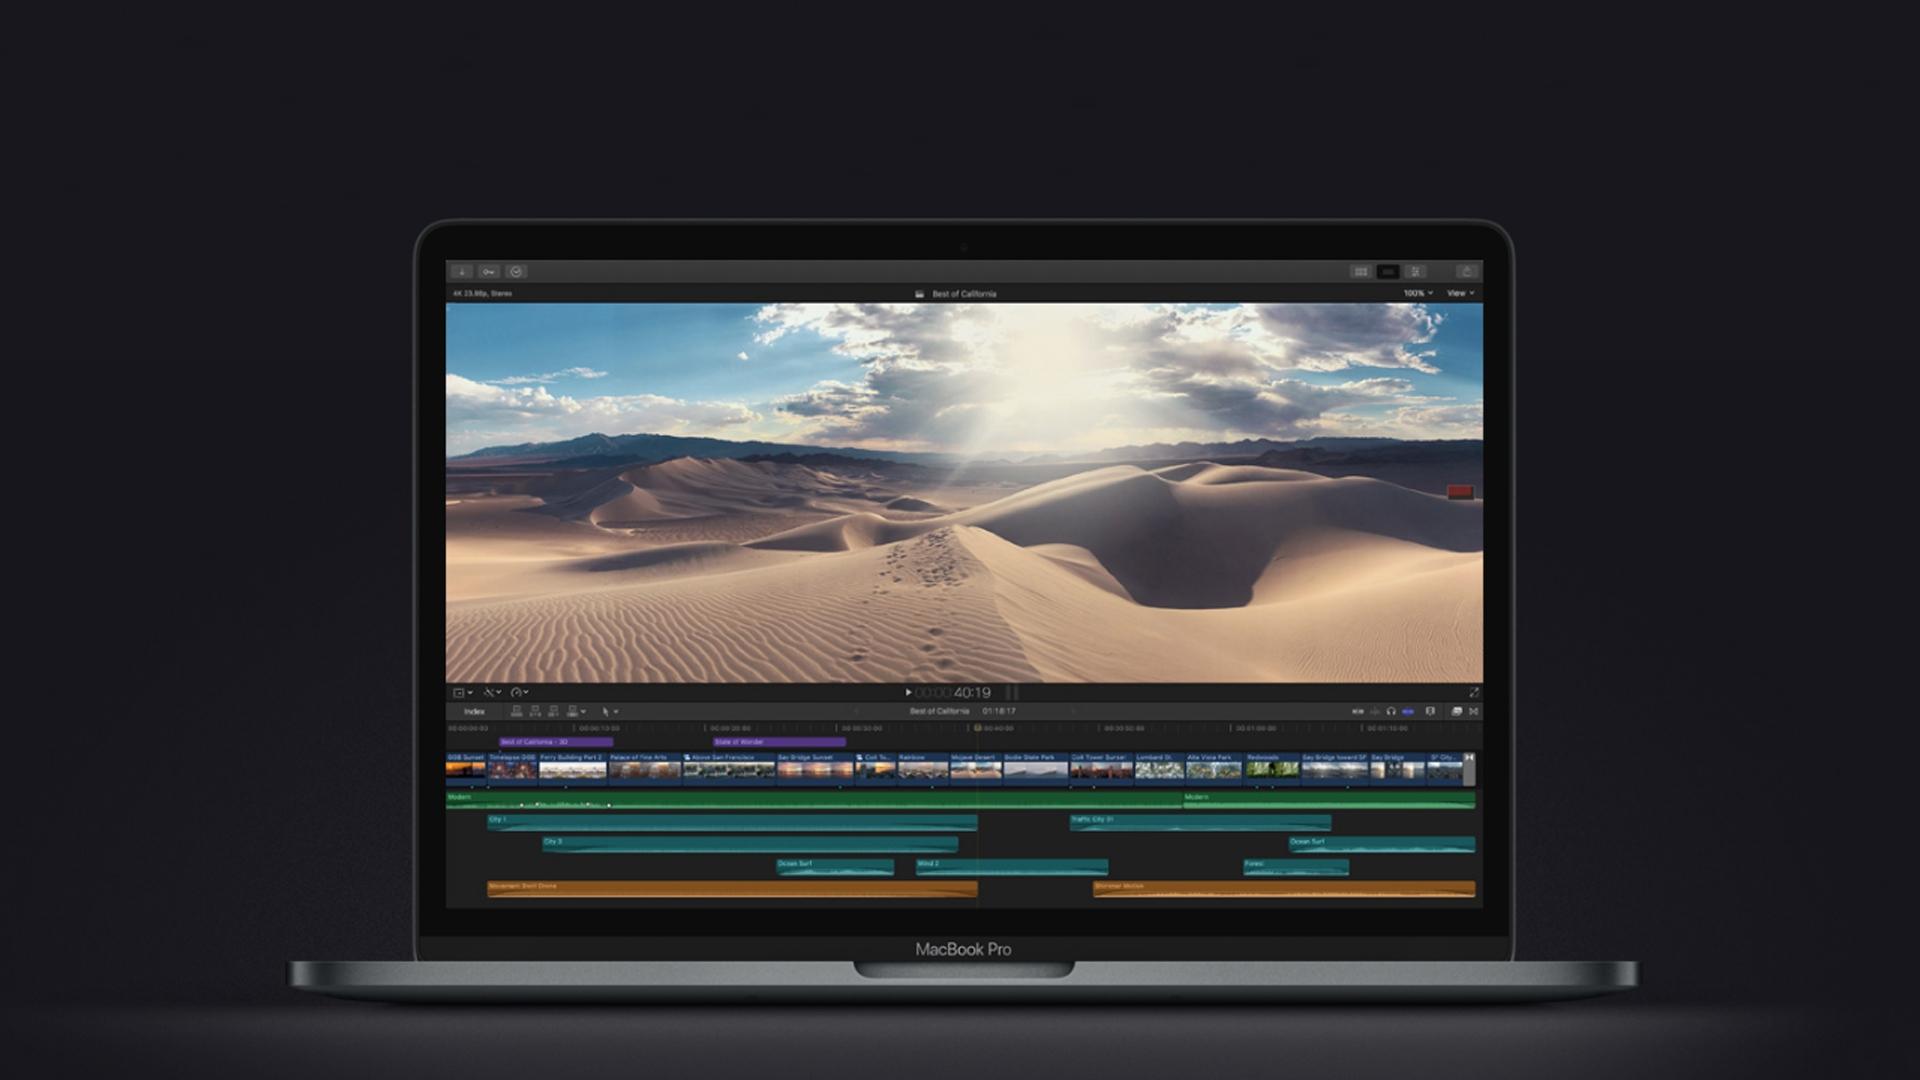 Hardware do Macbook Pro 13